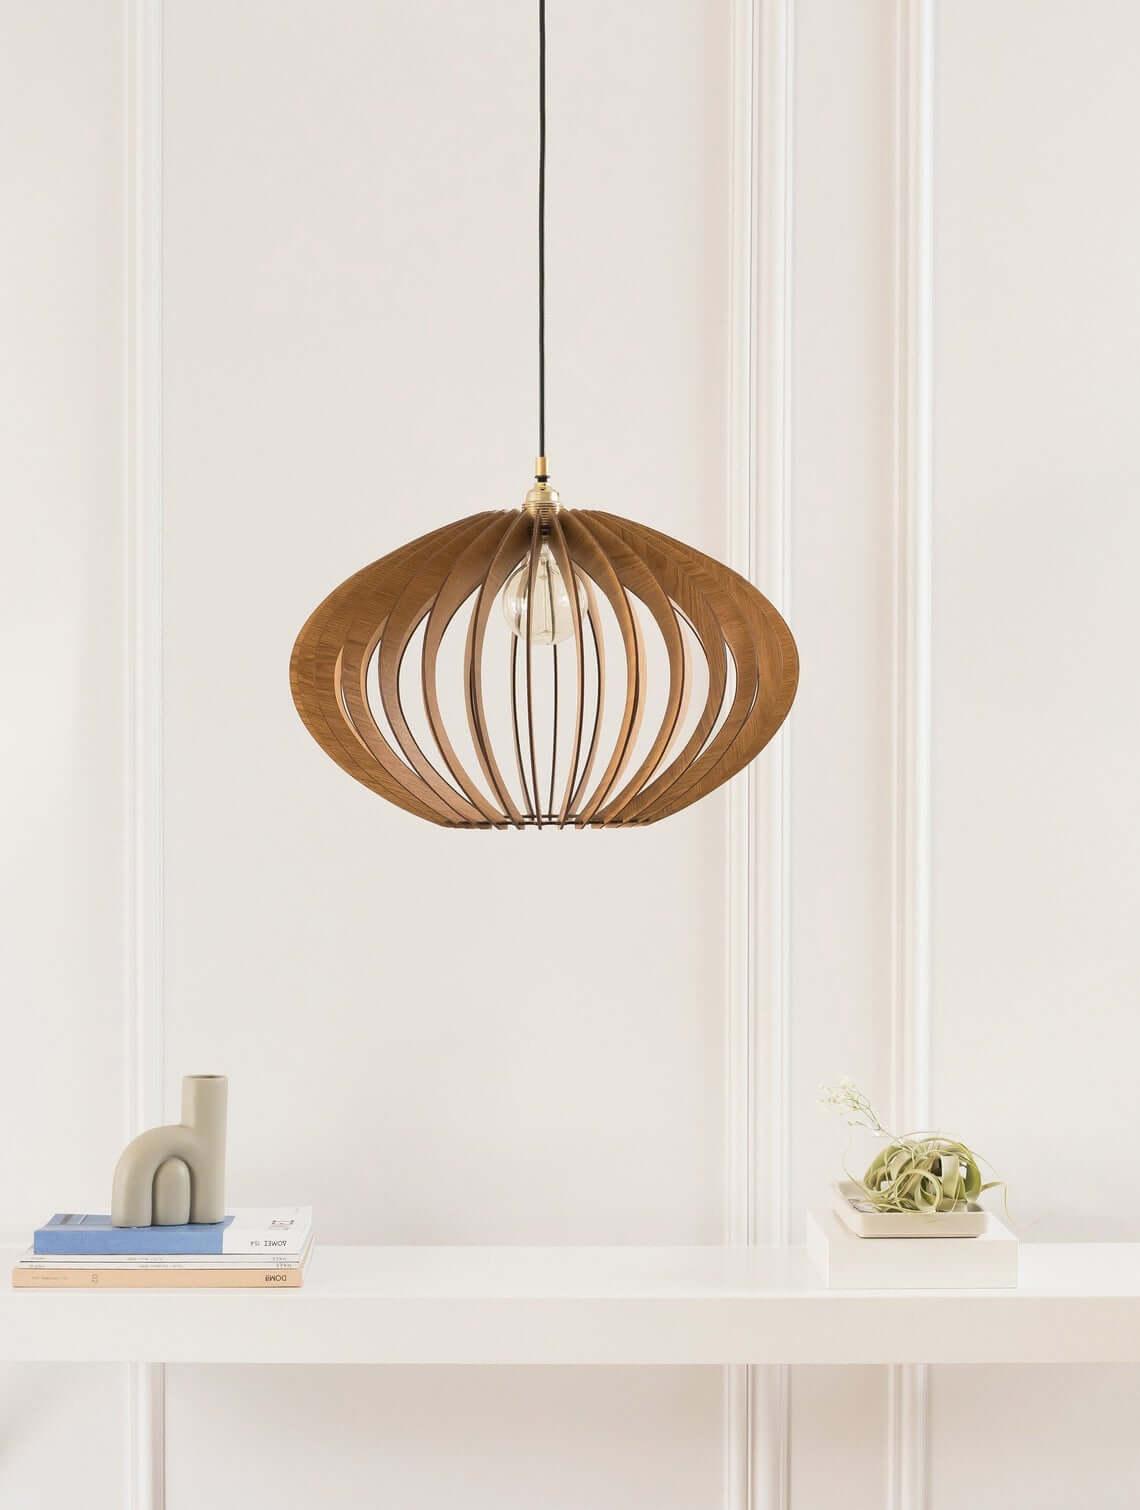 Wood Pendant Hanging Light Fixture